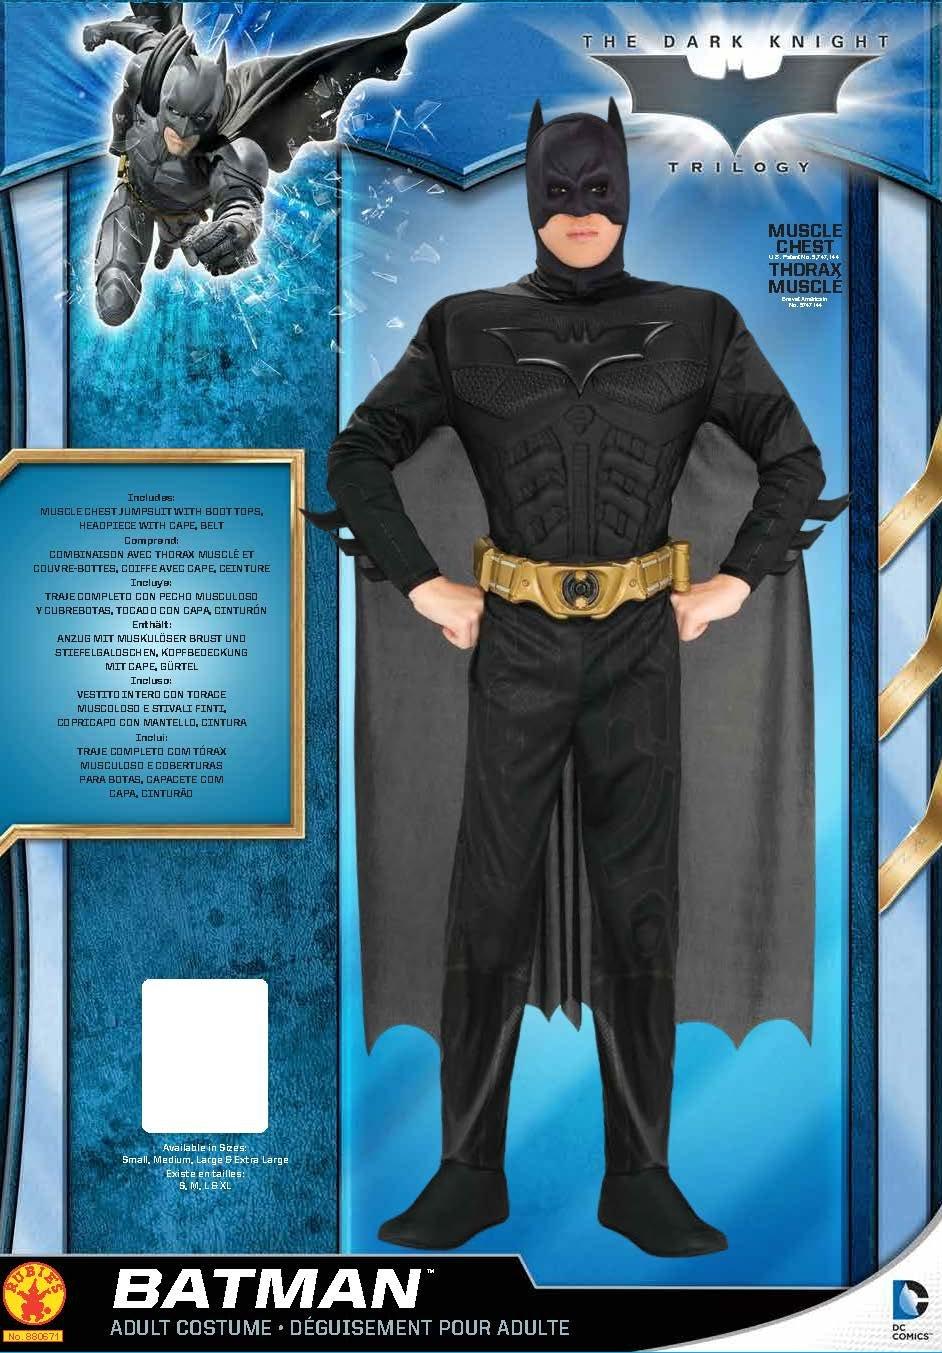 Nero Poliestere M Rubies 880671 Costume di Batman per uomo